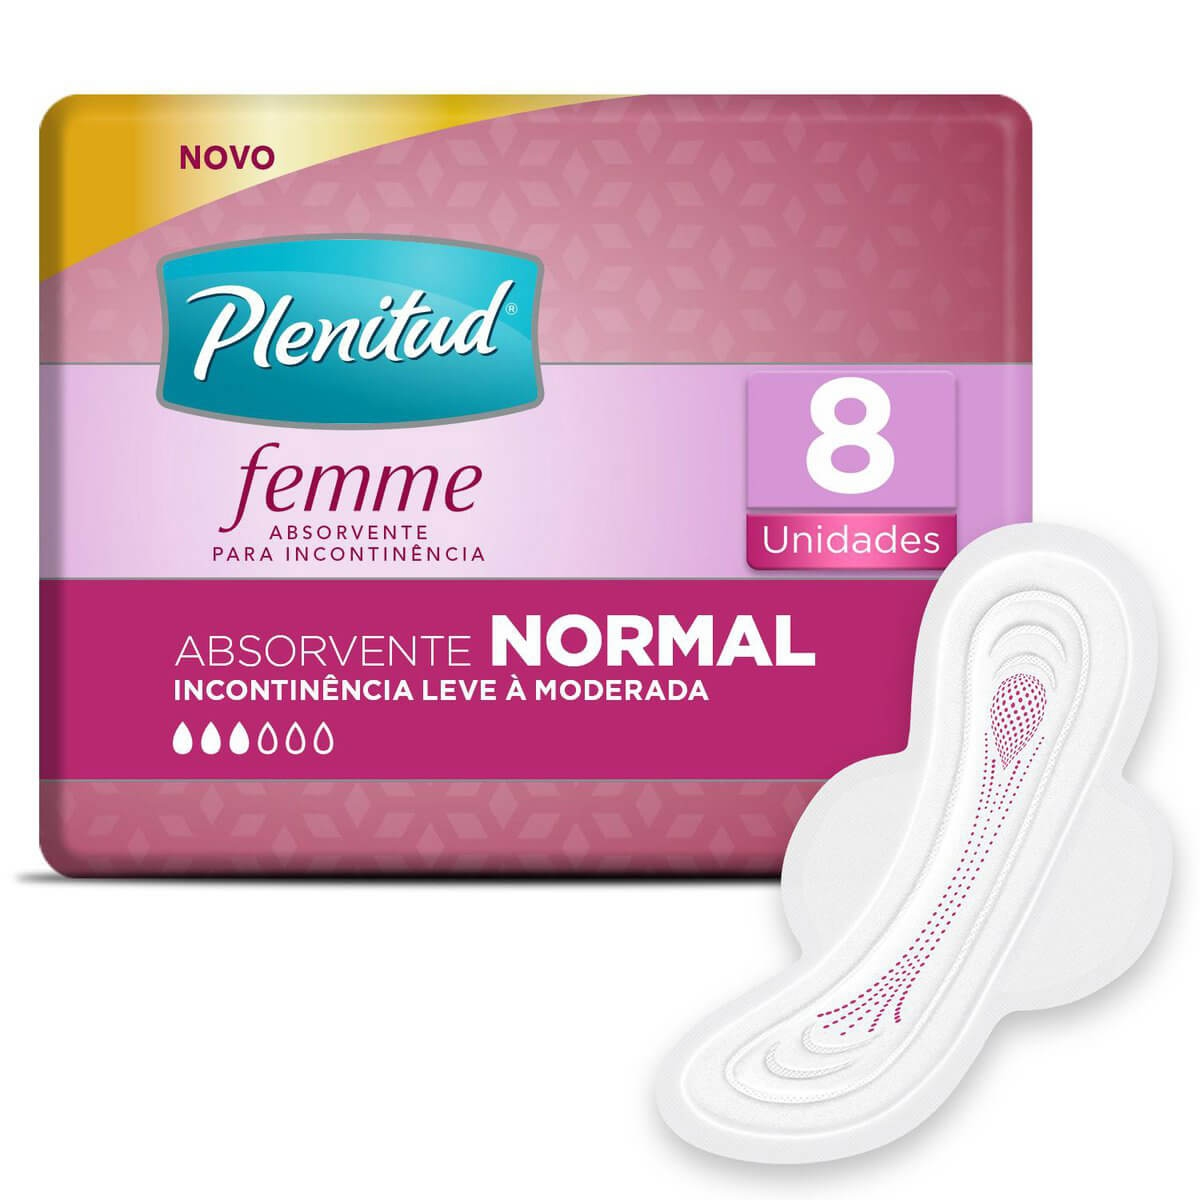 Absorvente Plenitud Femme Normal com Abas 8 Unidades